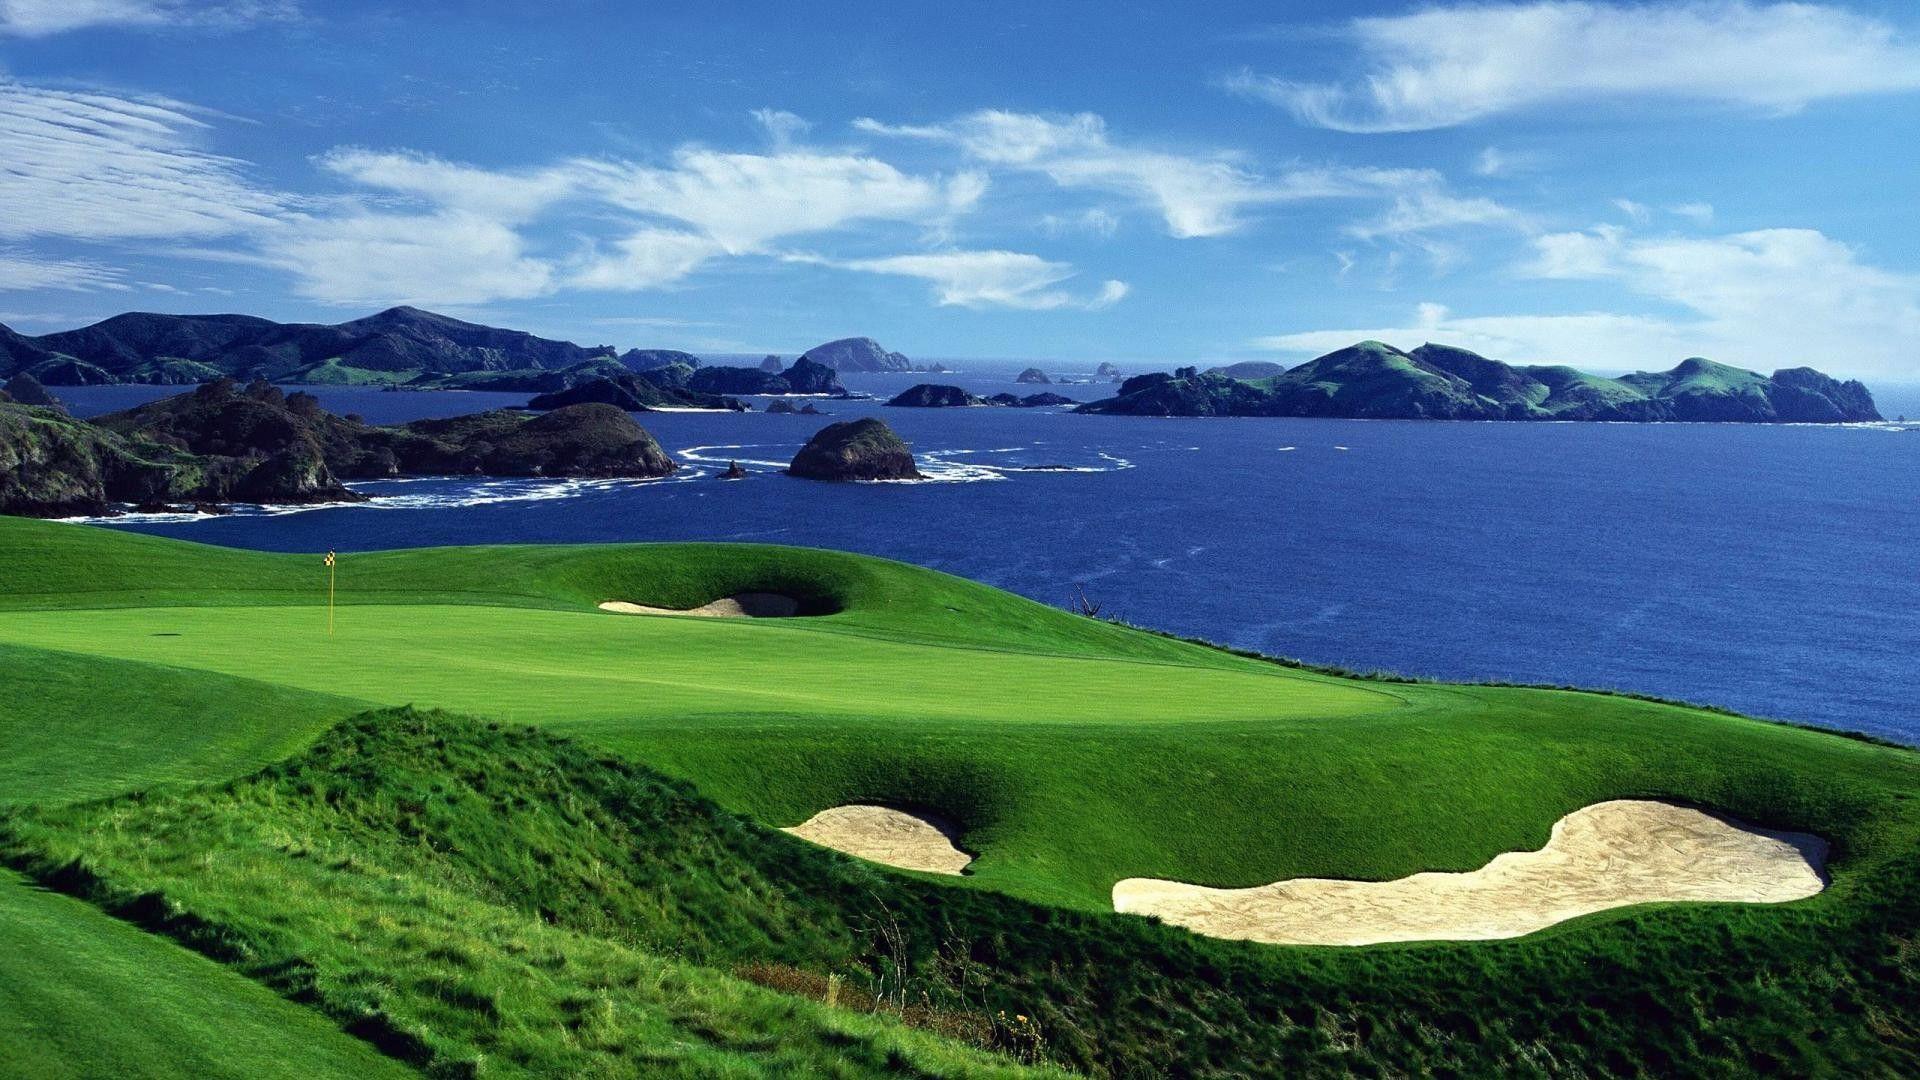 Hd Golf Wallpapers Wallpaper Cave